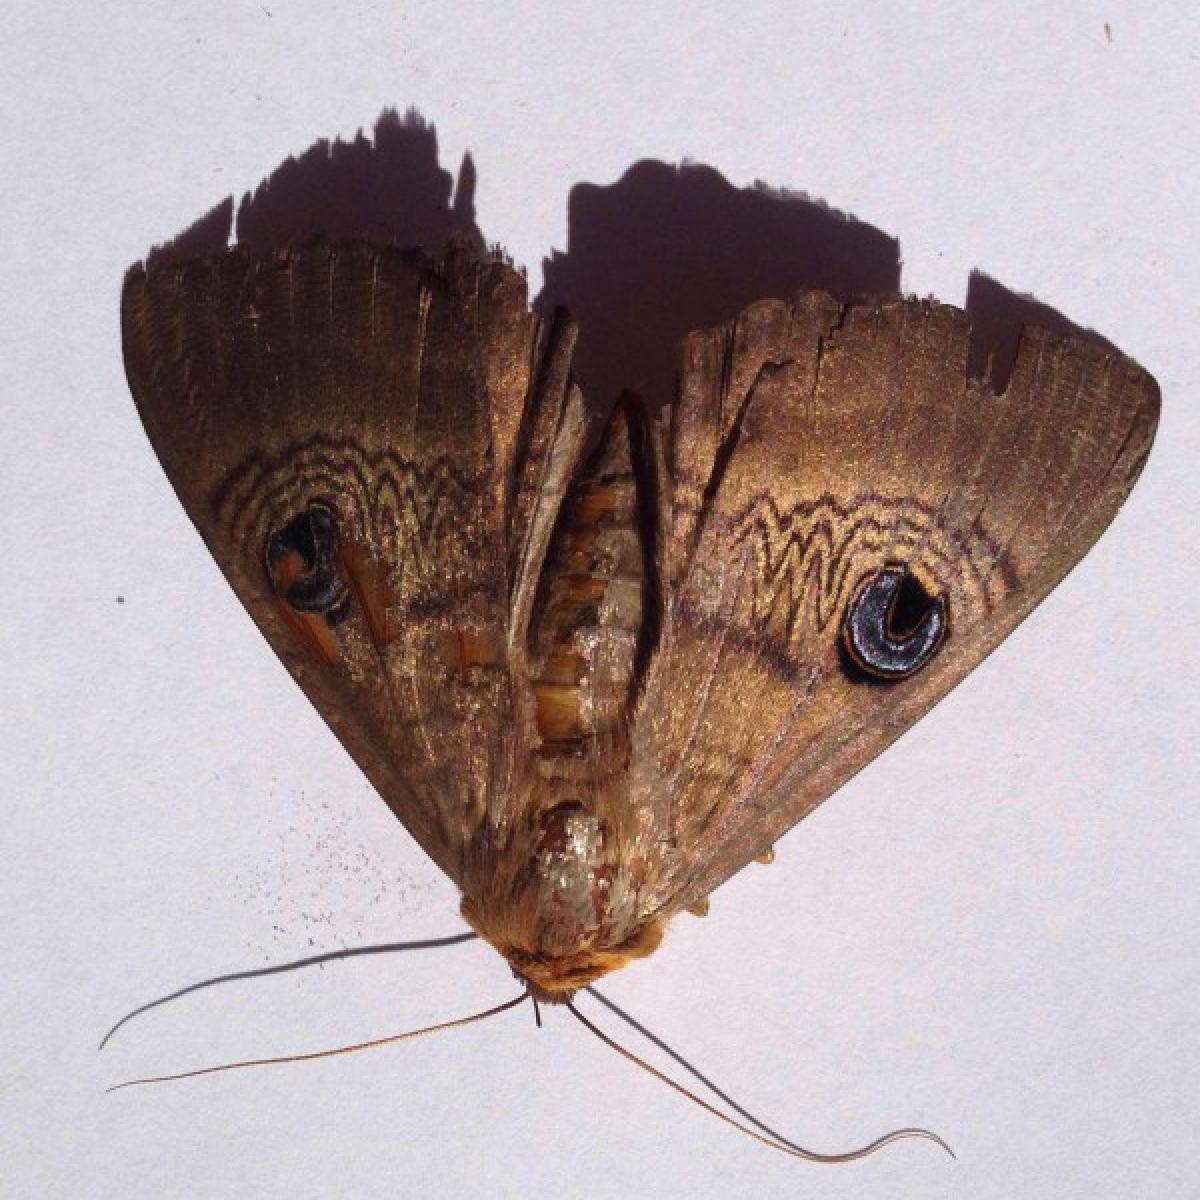 Moth - Dasypodia selevnophora